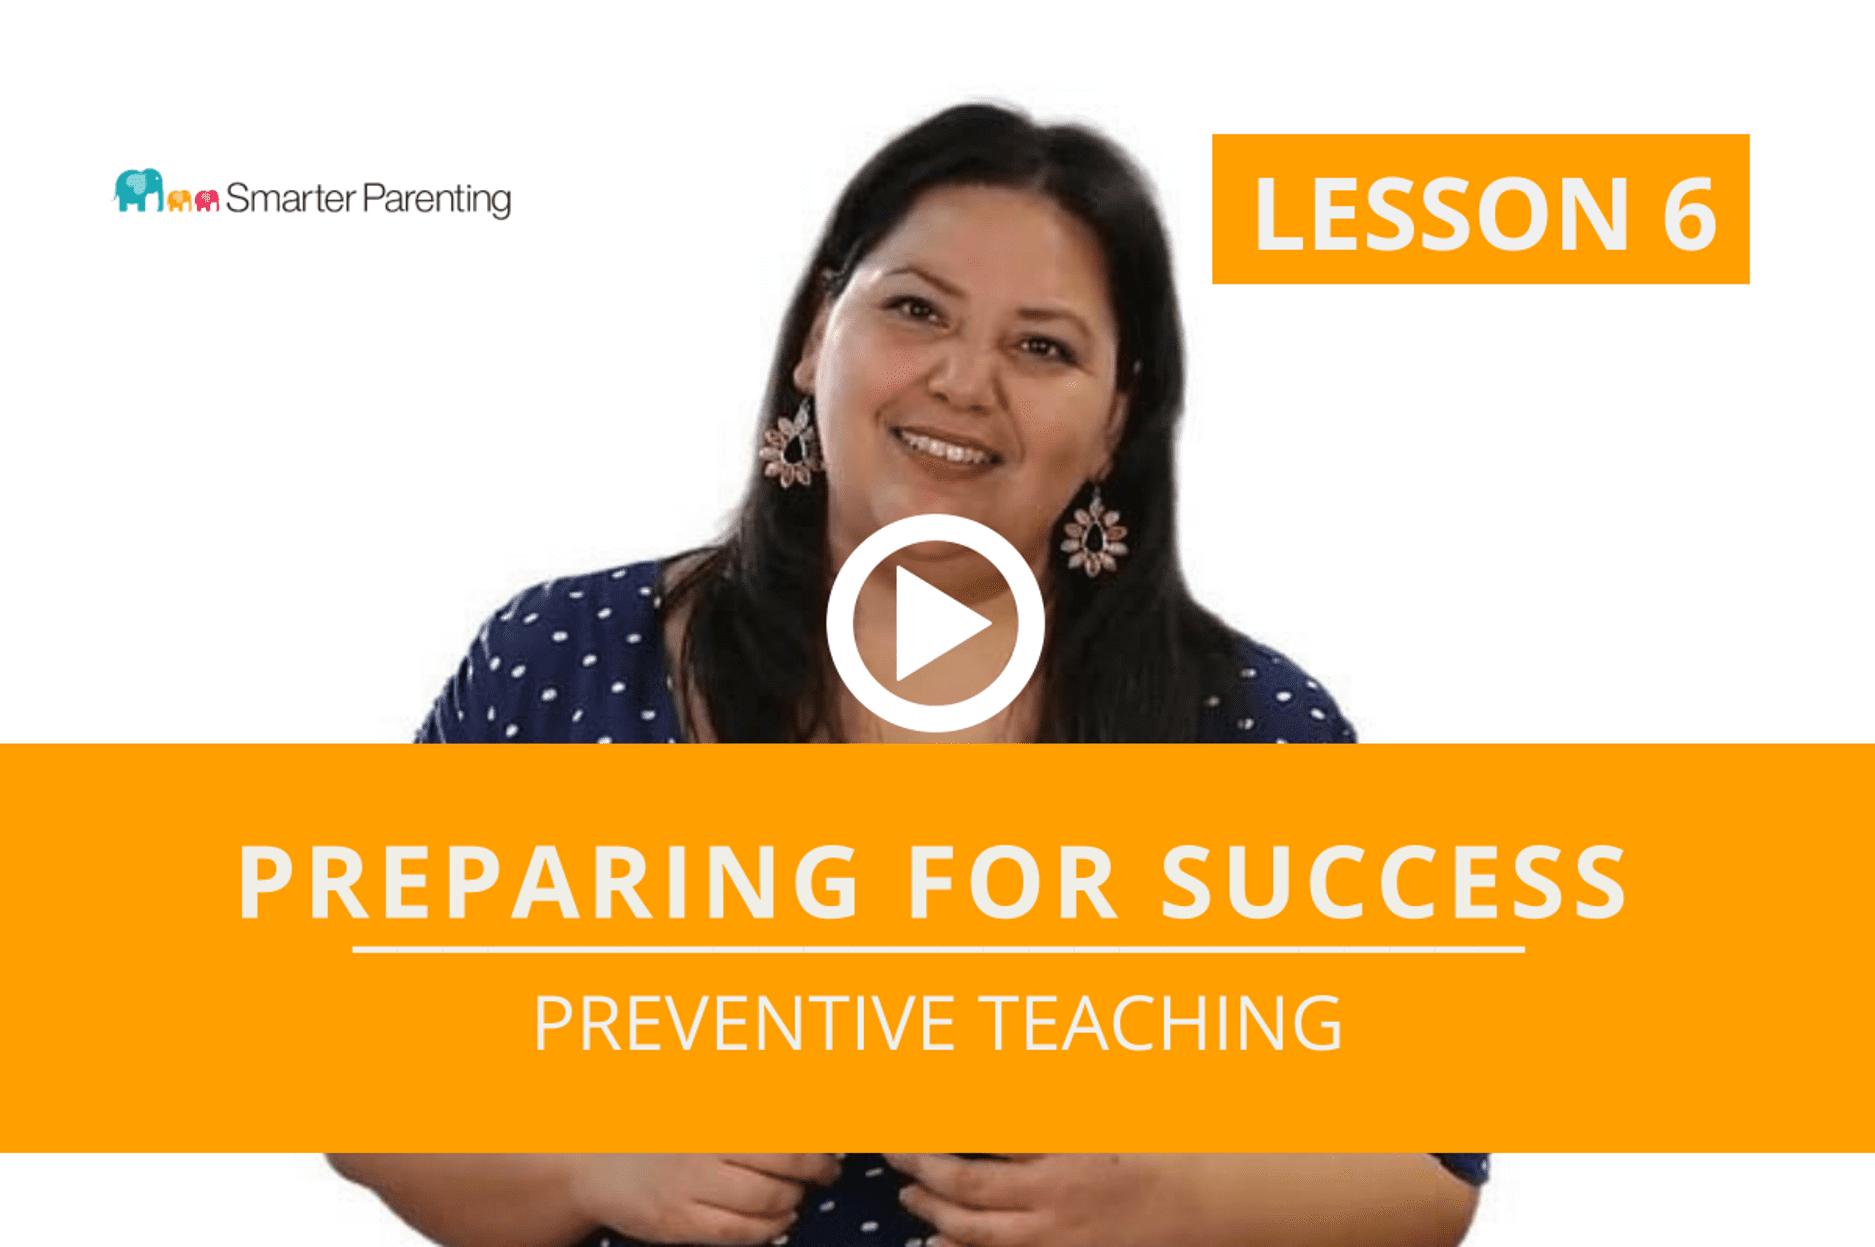 Preventive Teaching lesson link